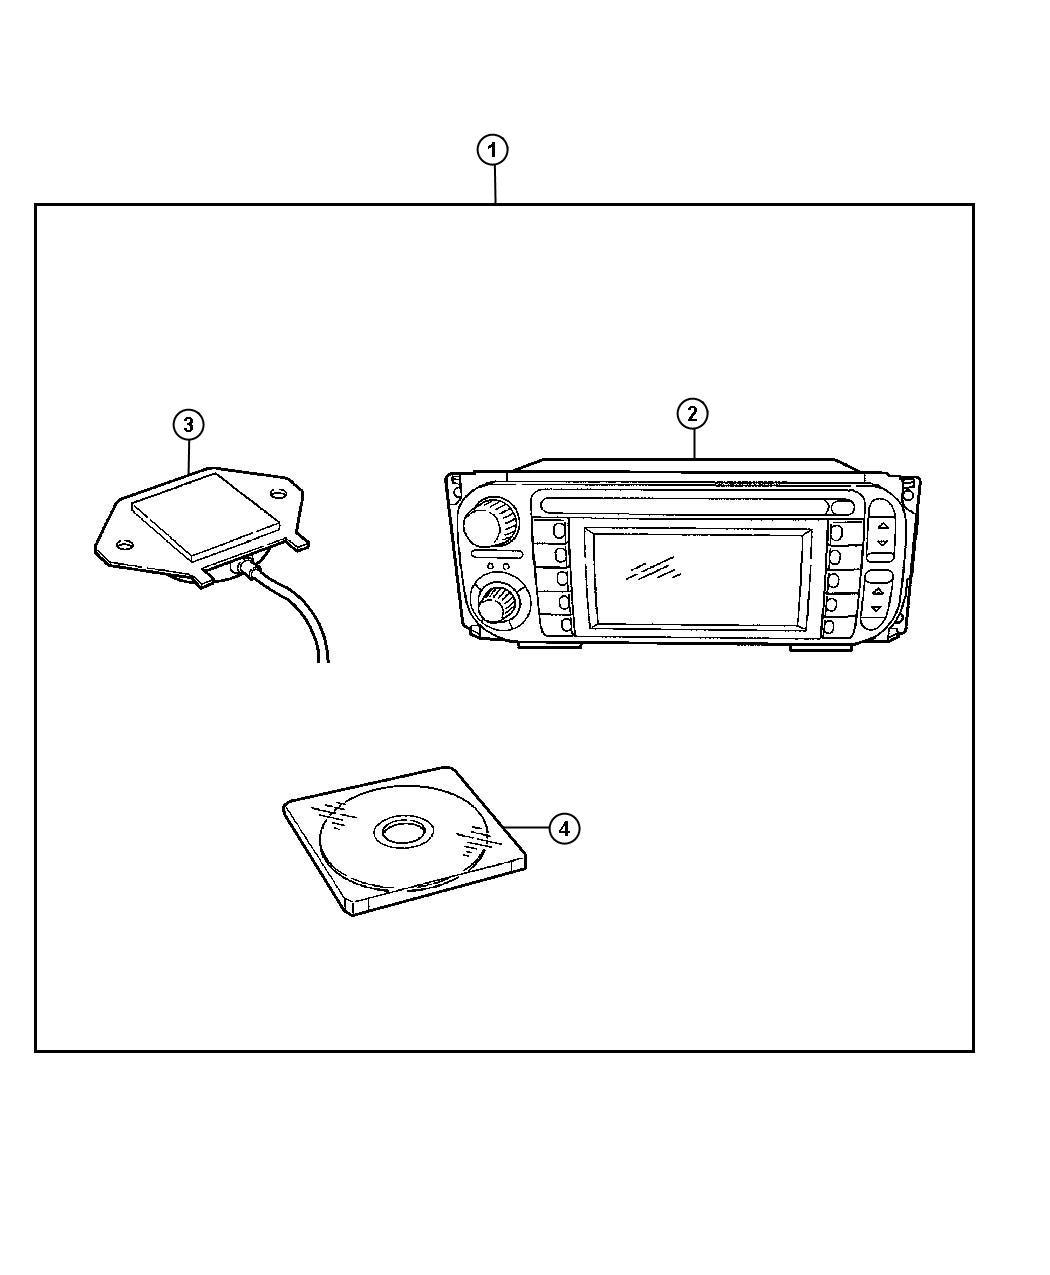 Dodge Ram Radio Used For Am Fm Cd W Nav Dvd And Cd